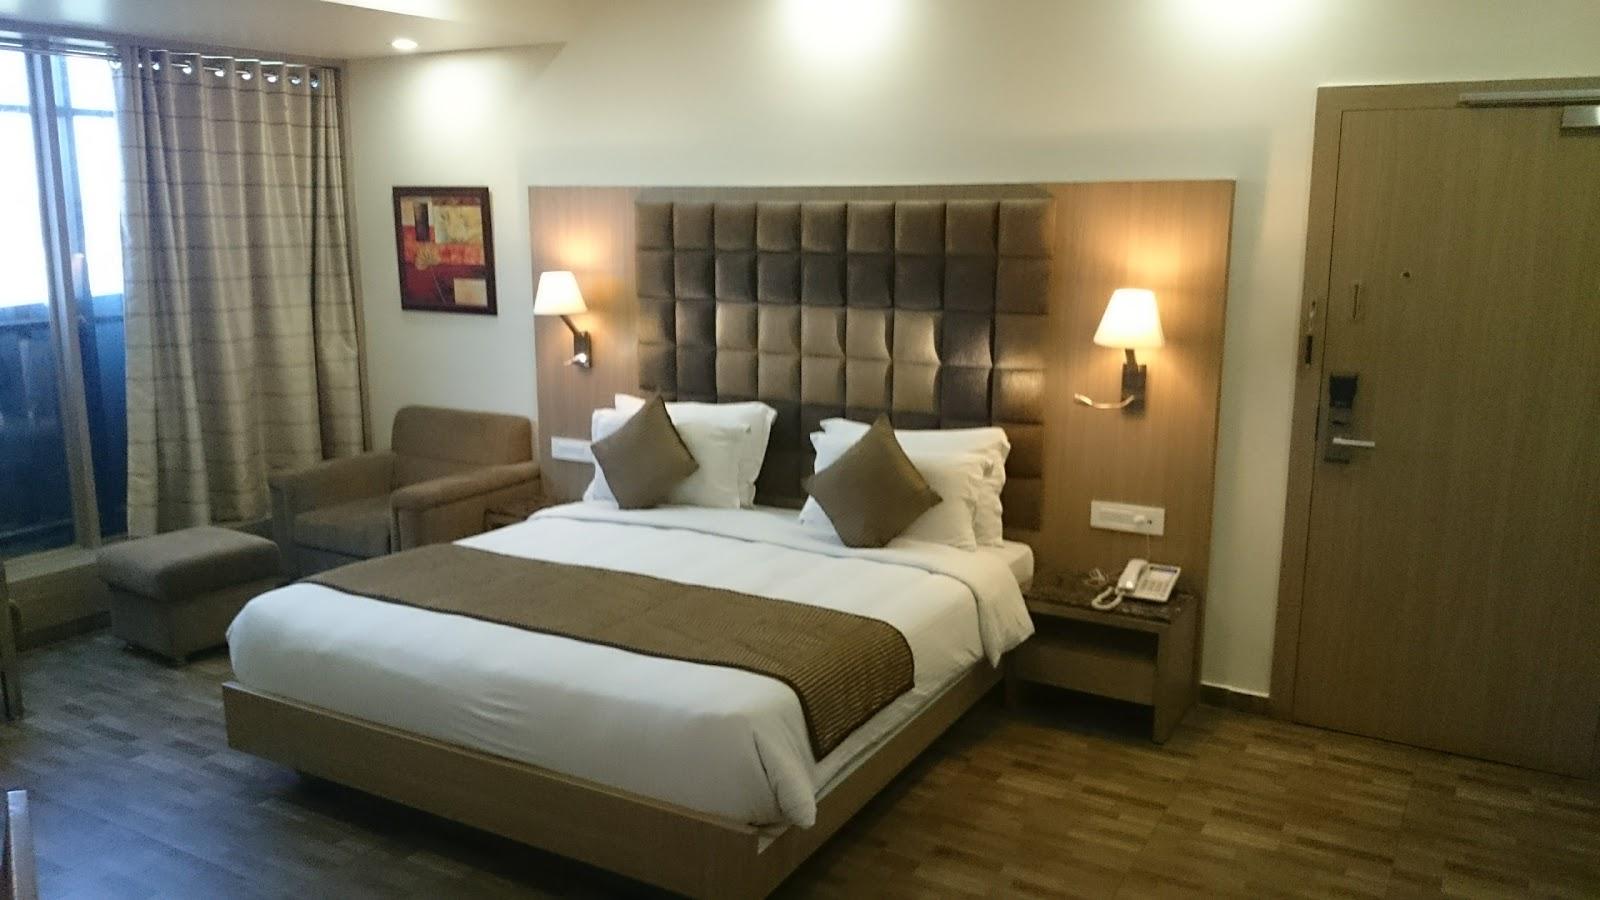 Hotel Nova Kd Comfort Essar House Around Guides